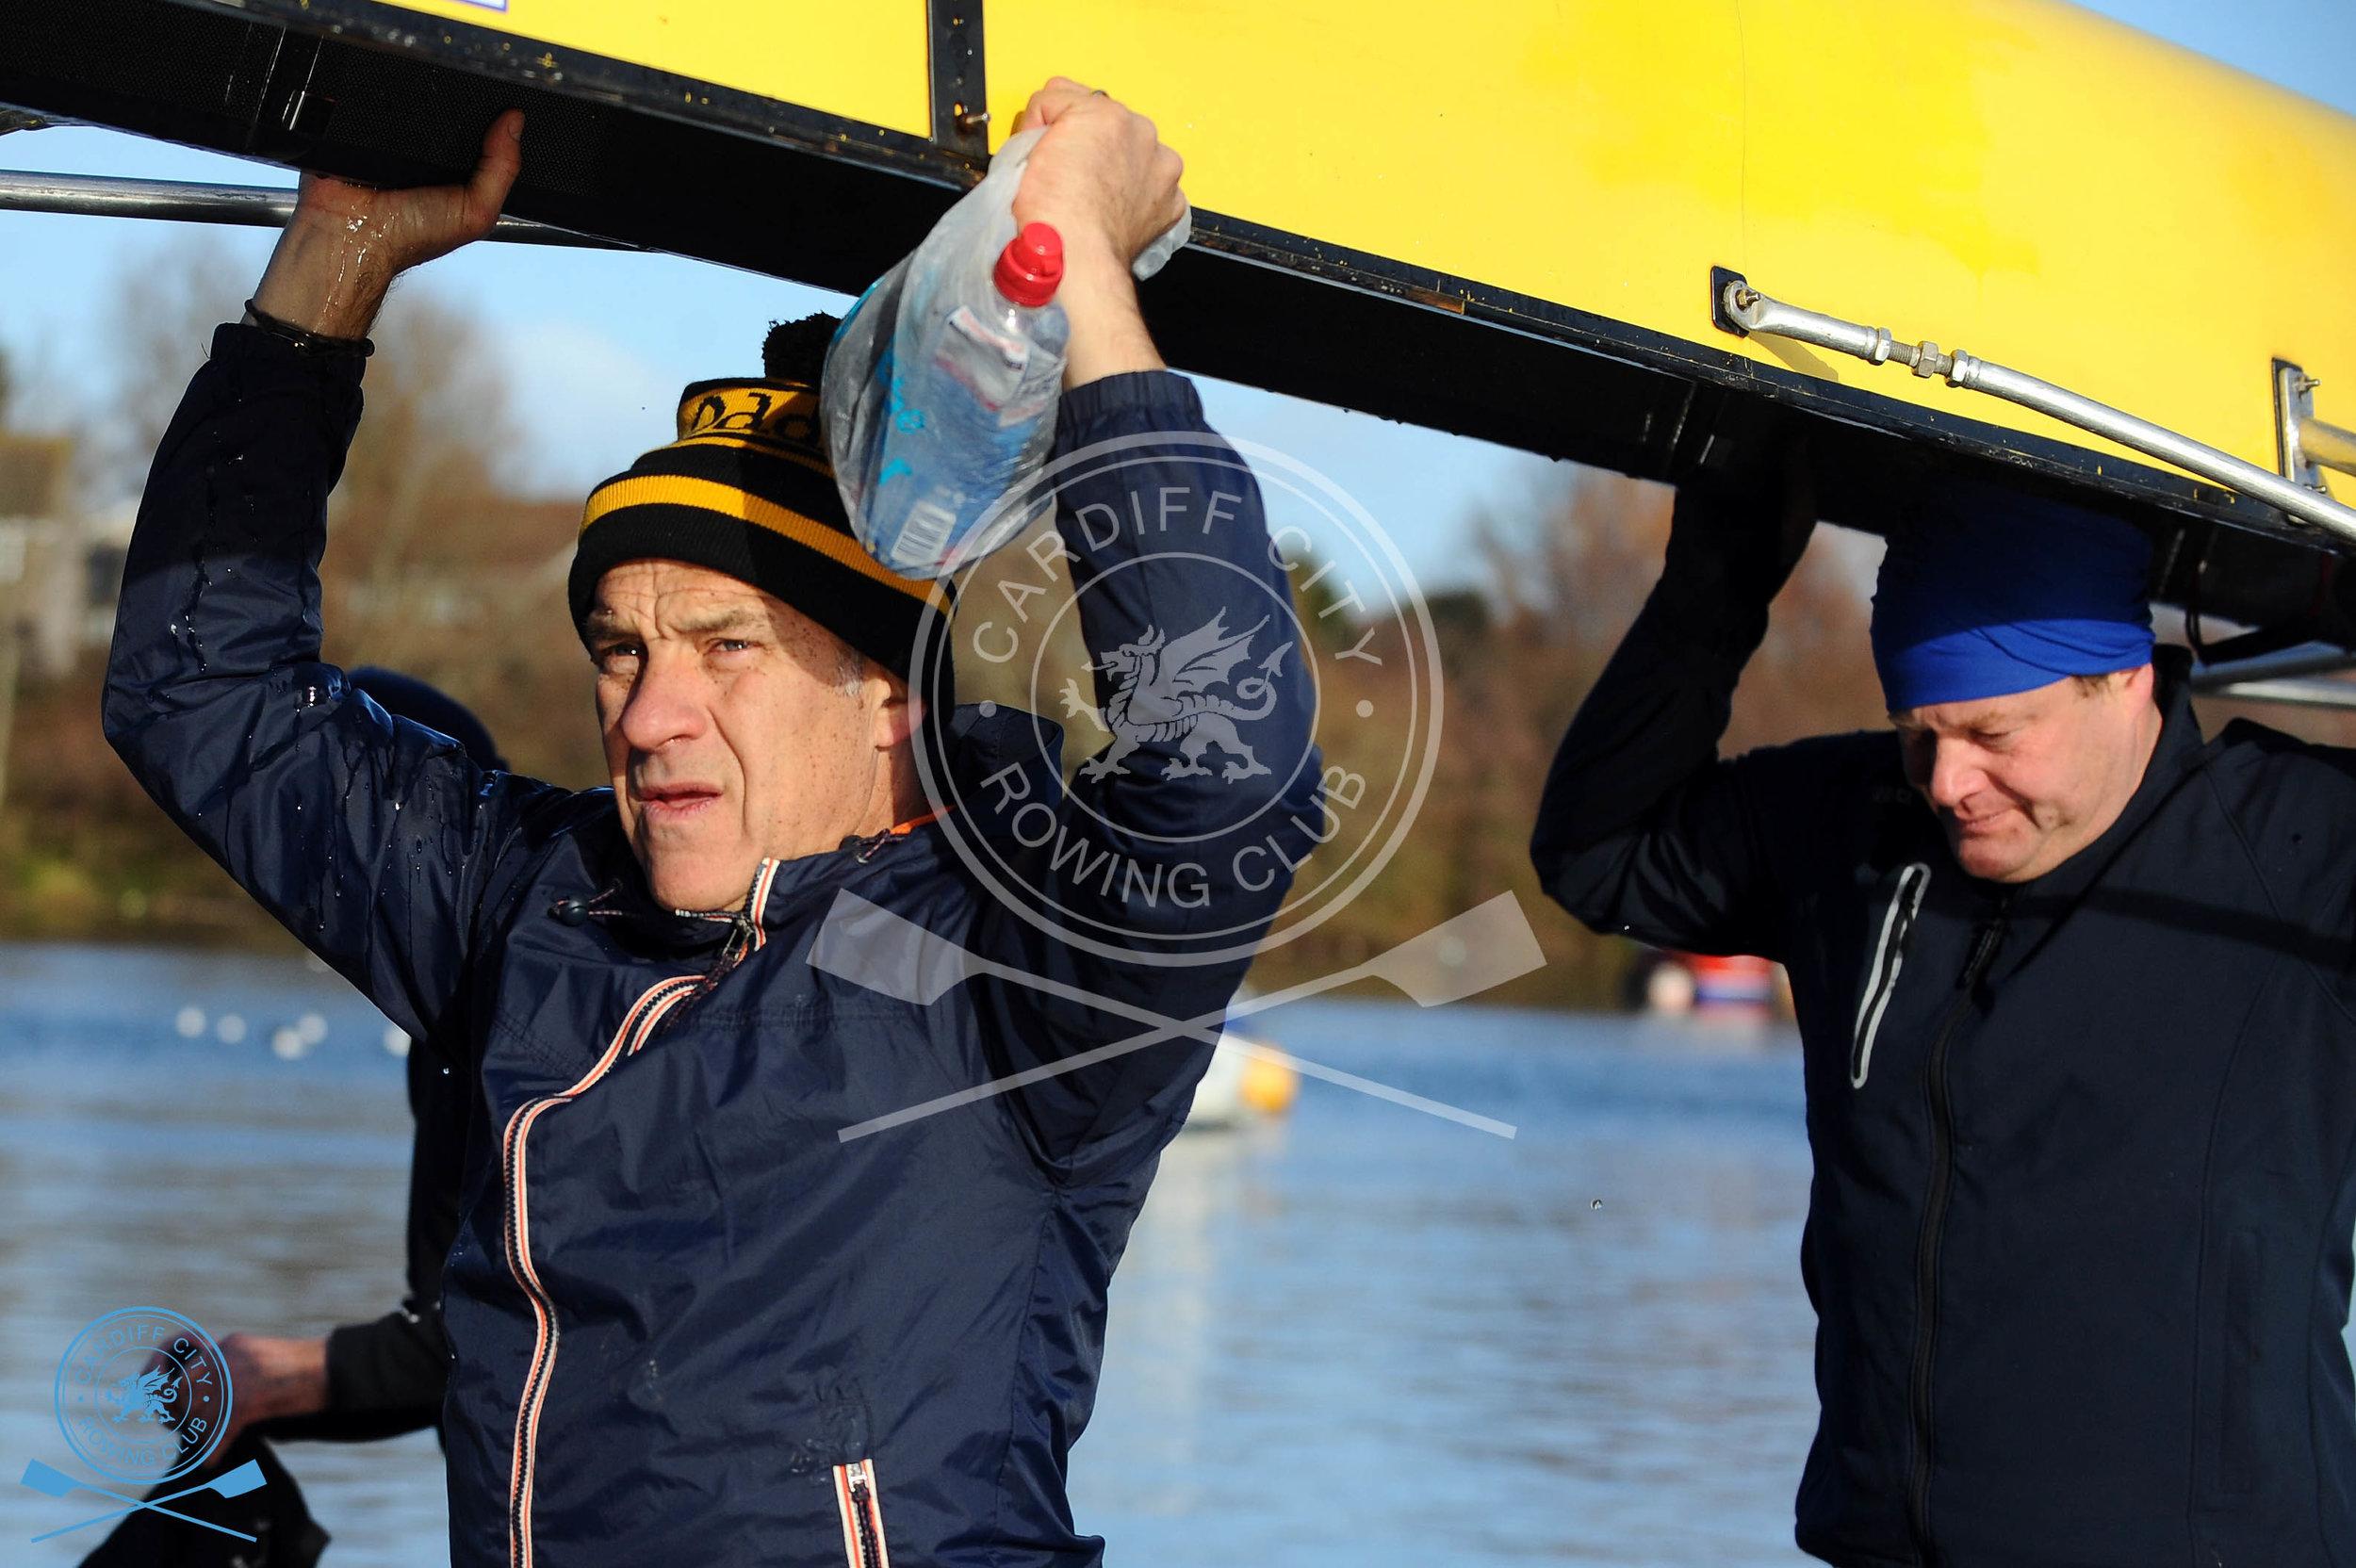 DW_280119_Cardiff_City_Rowing_347.jpg